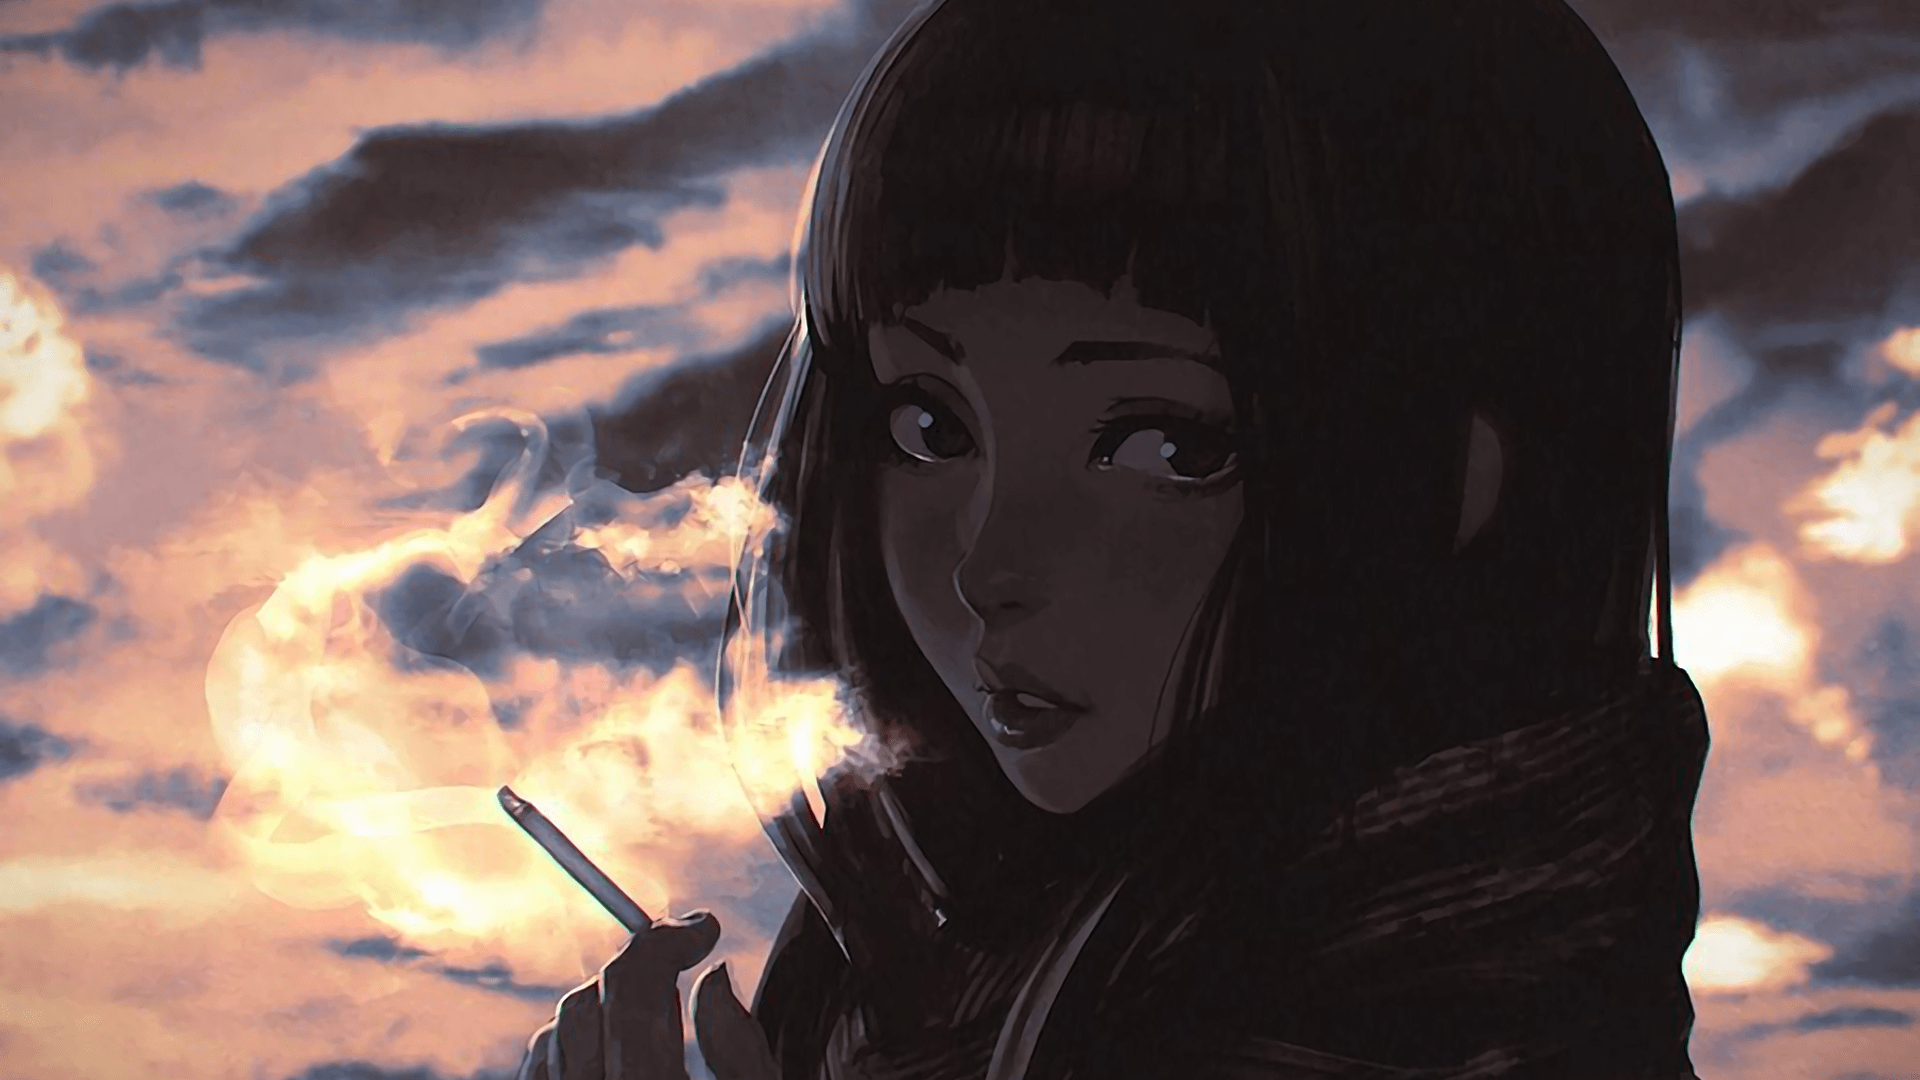 Girls Smoking Anime Wallpapers Wallpaper Cave